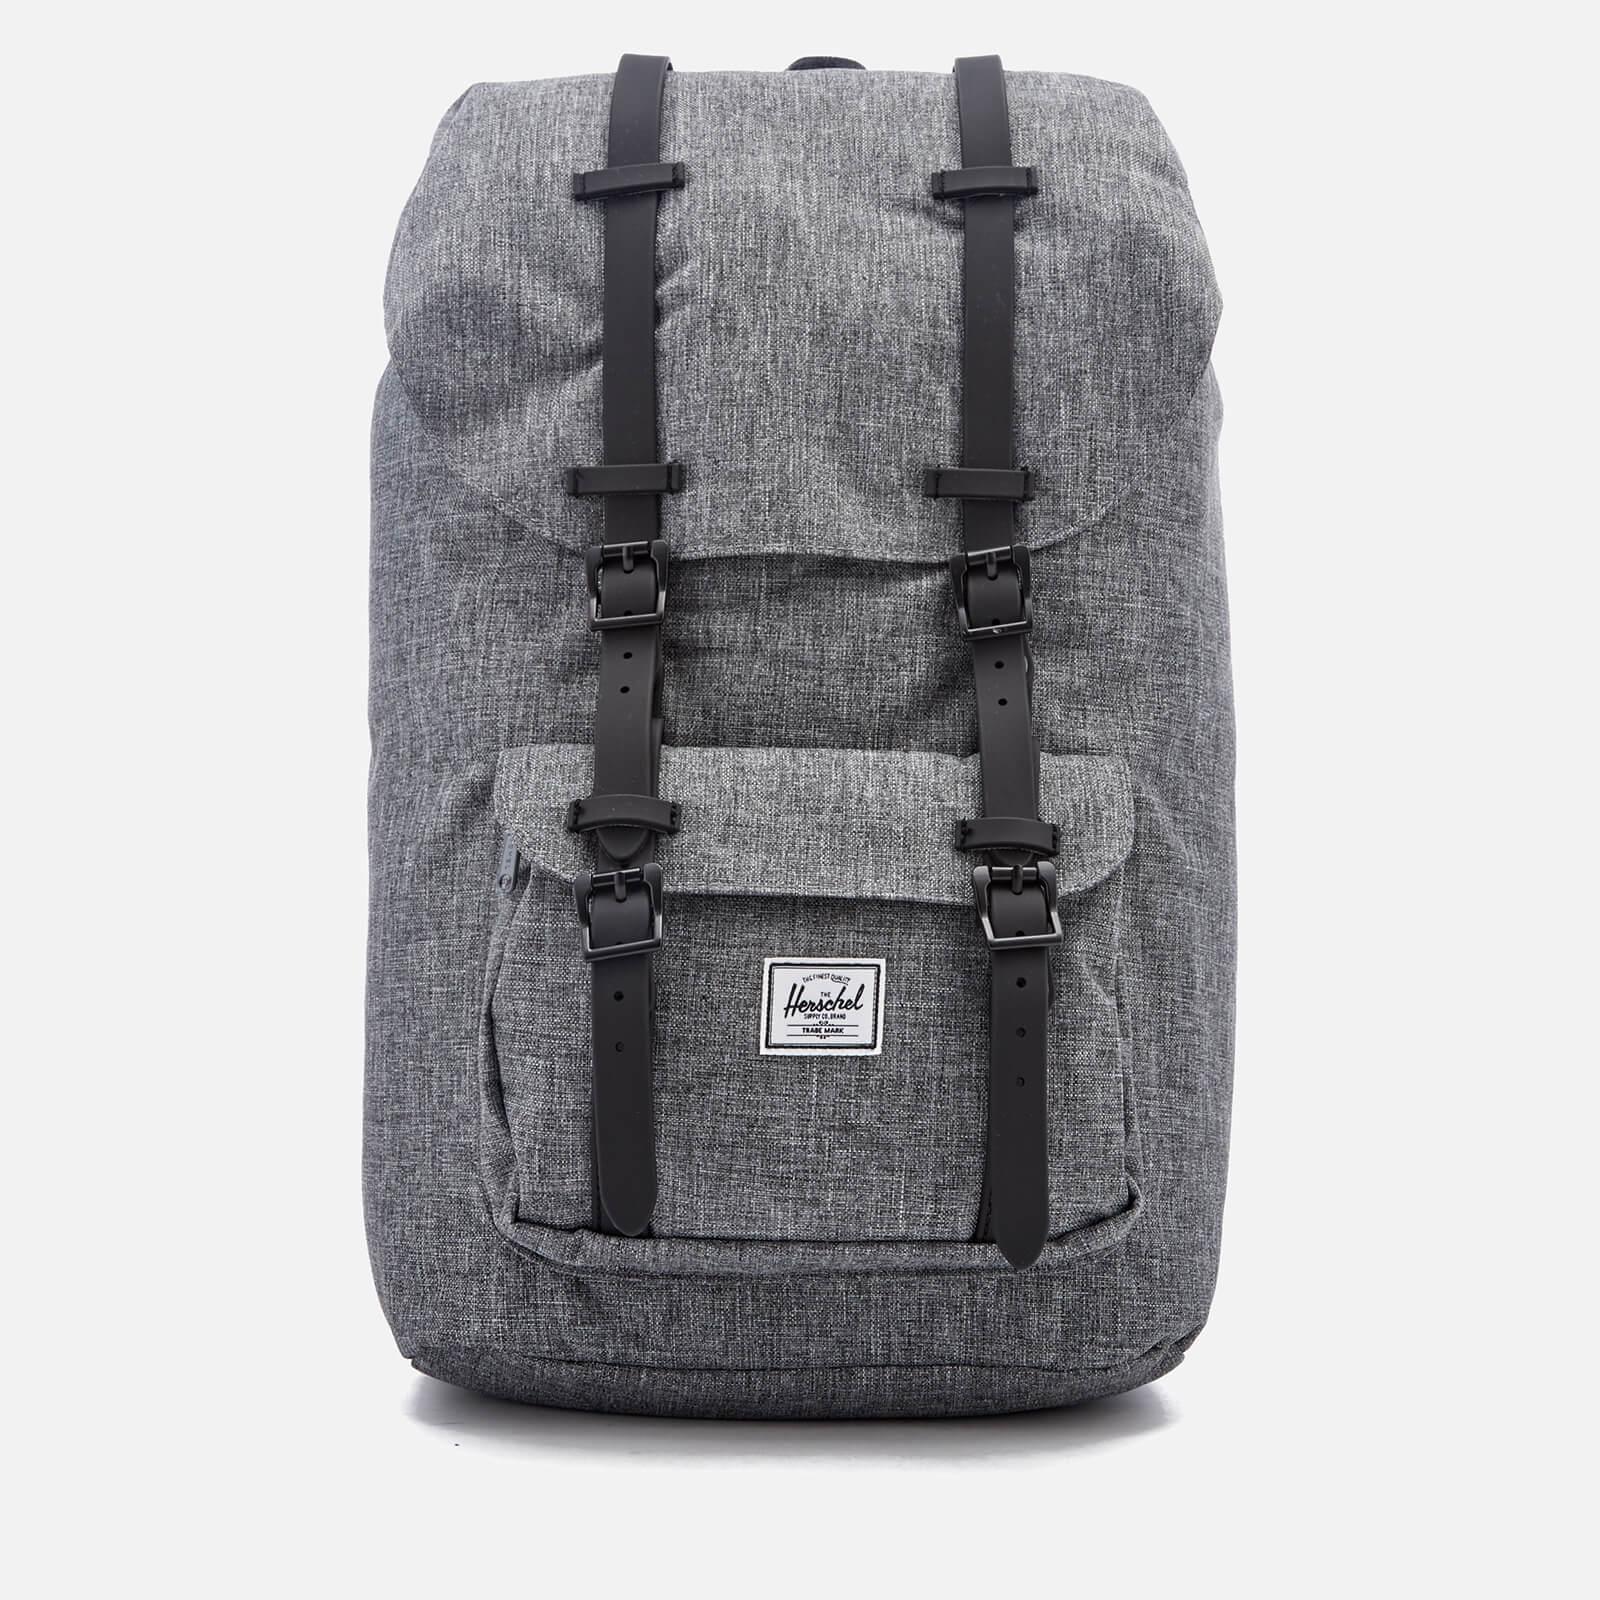 a8c428e8744 Herschel Supply Co. Men s Little America Backpack - Raven Crosshatch Black  Rubber - Free UK Delivery over £50